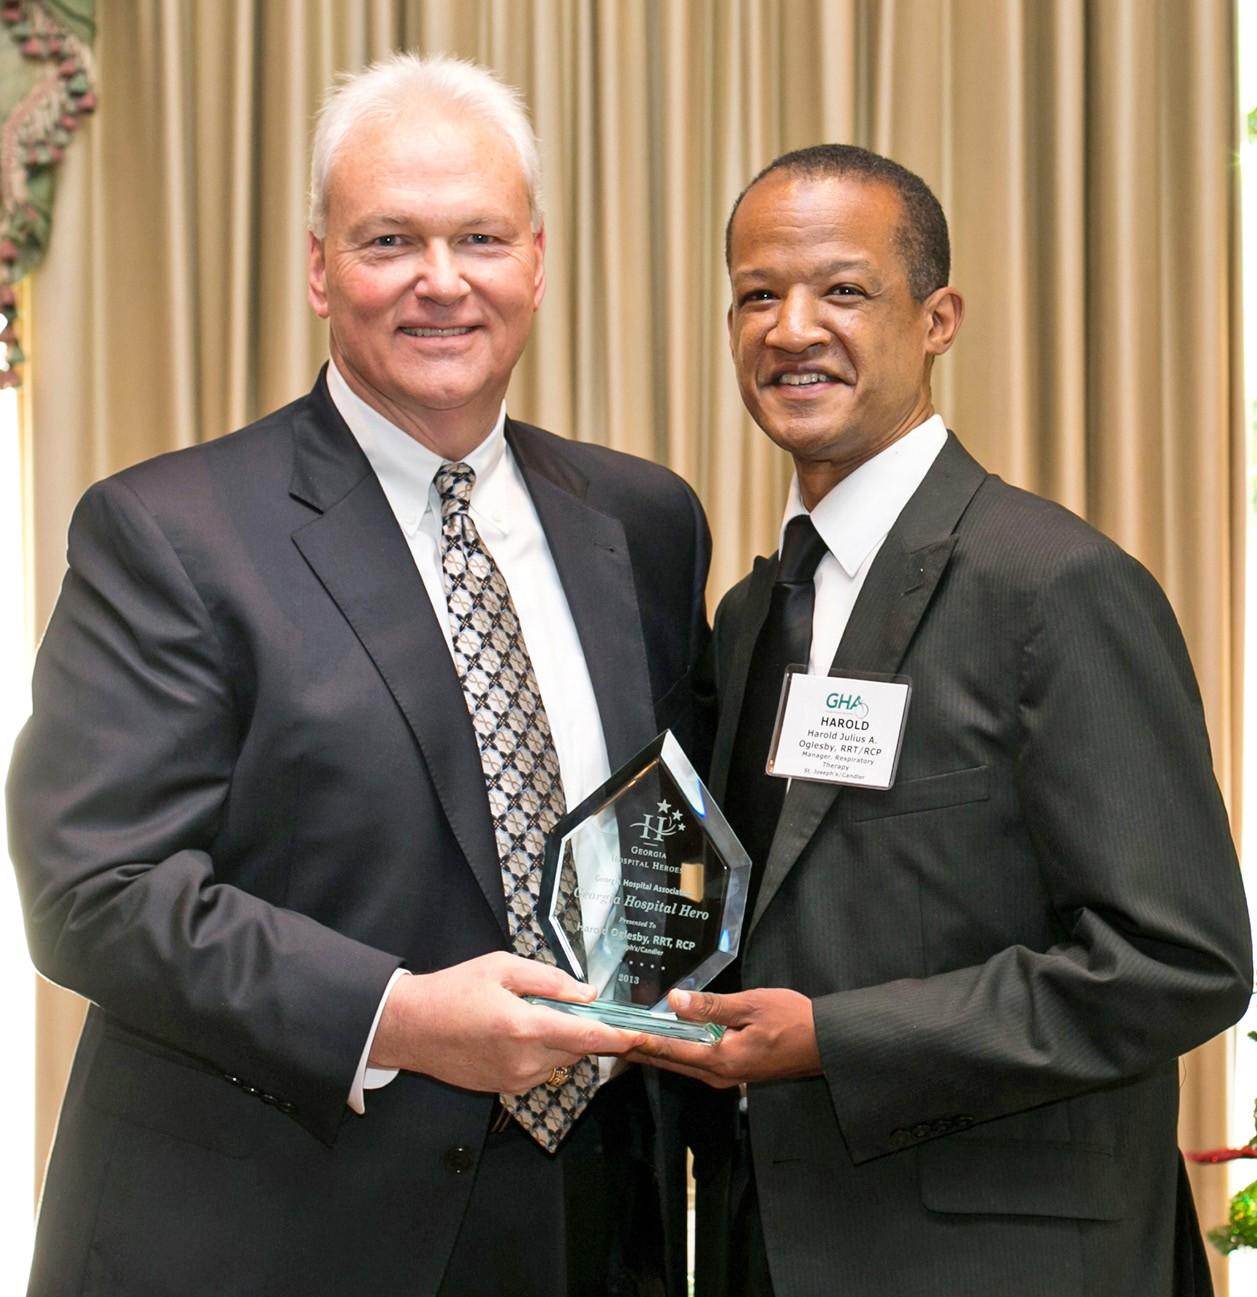 GHA President Earl Rogers (L) and St. Joseph's/Candler's Harold Oglesby (R)